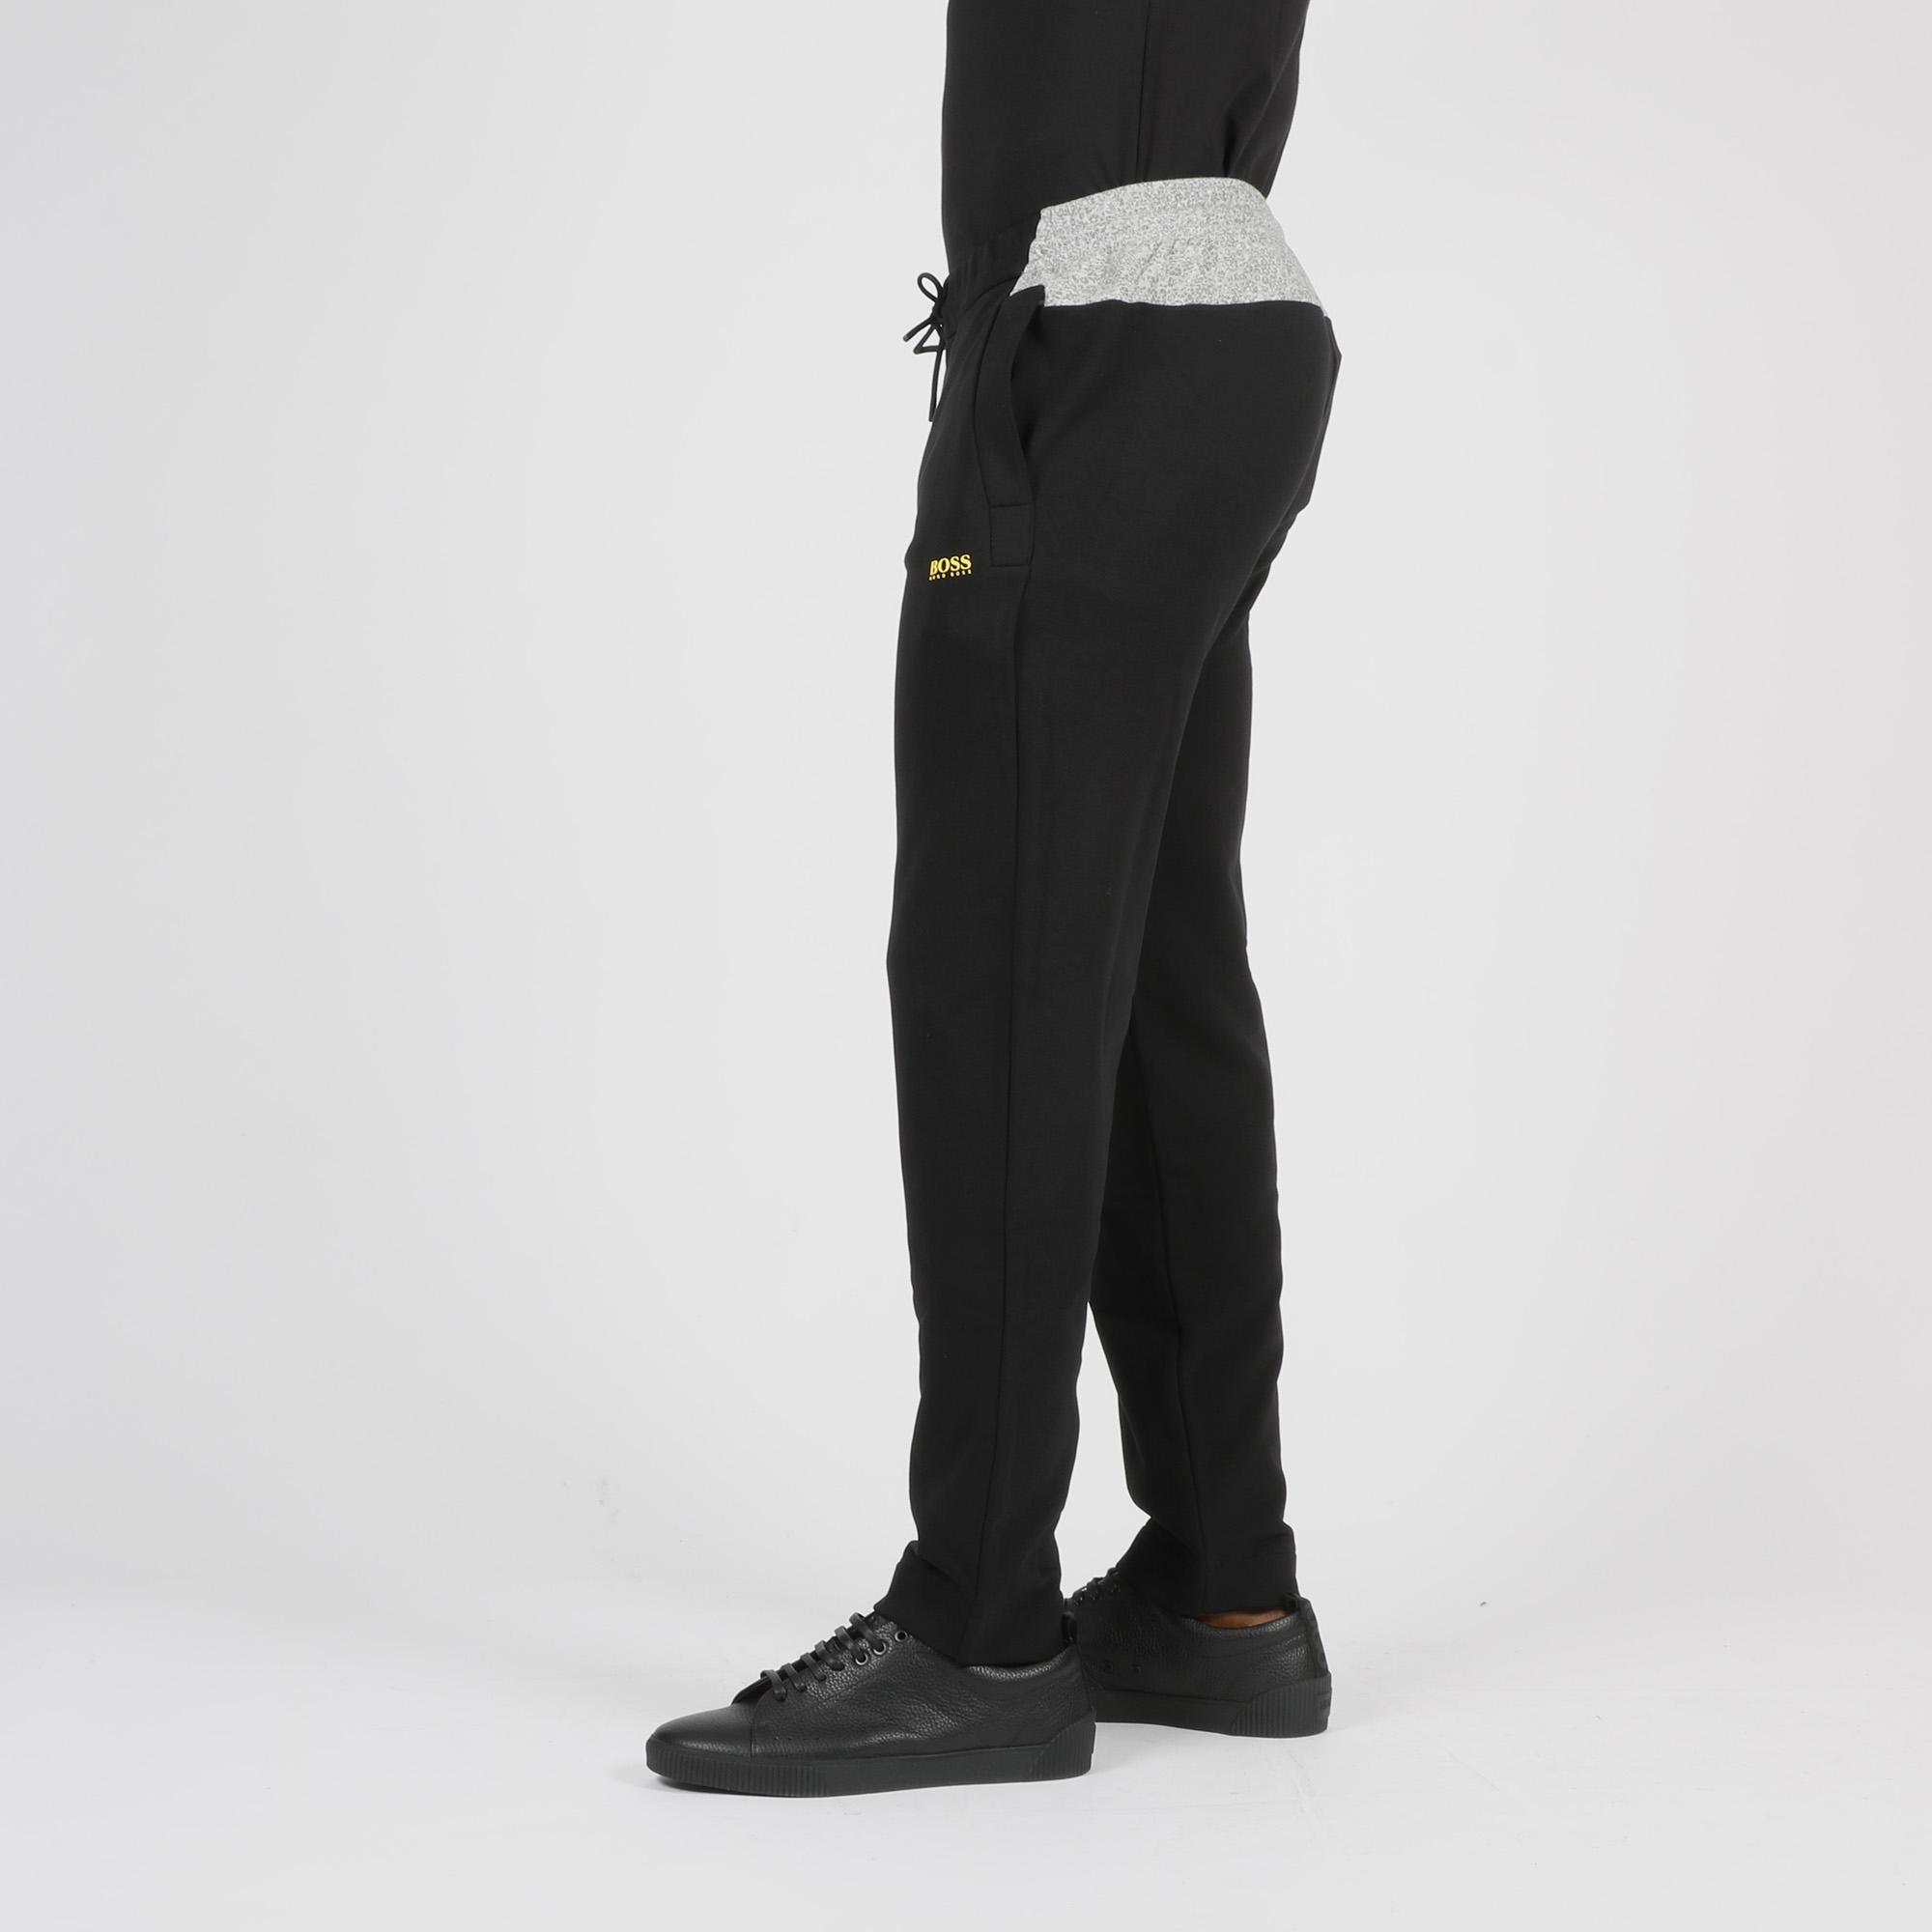 Pantalone tuta - Nero